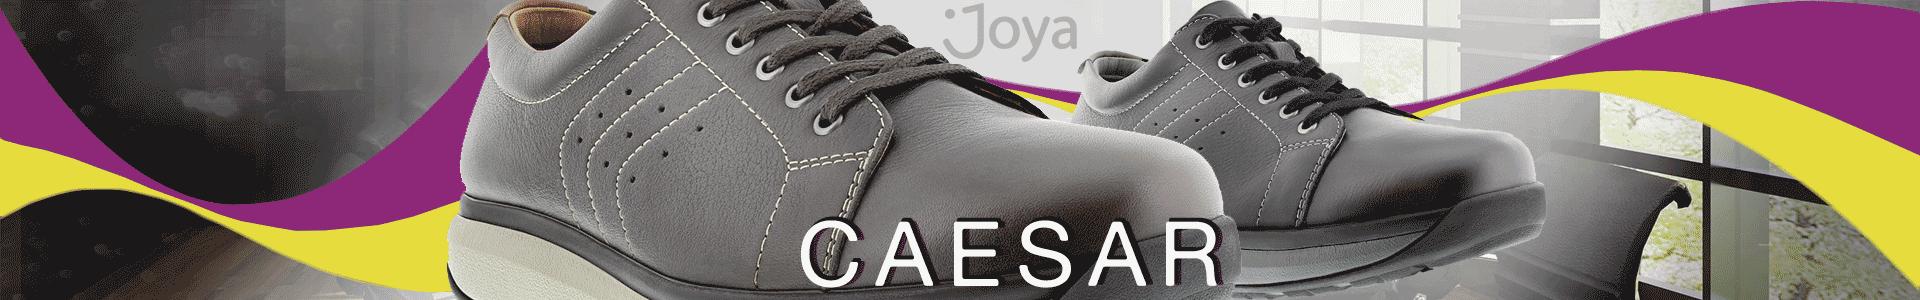 Joya Caesar